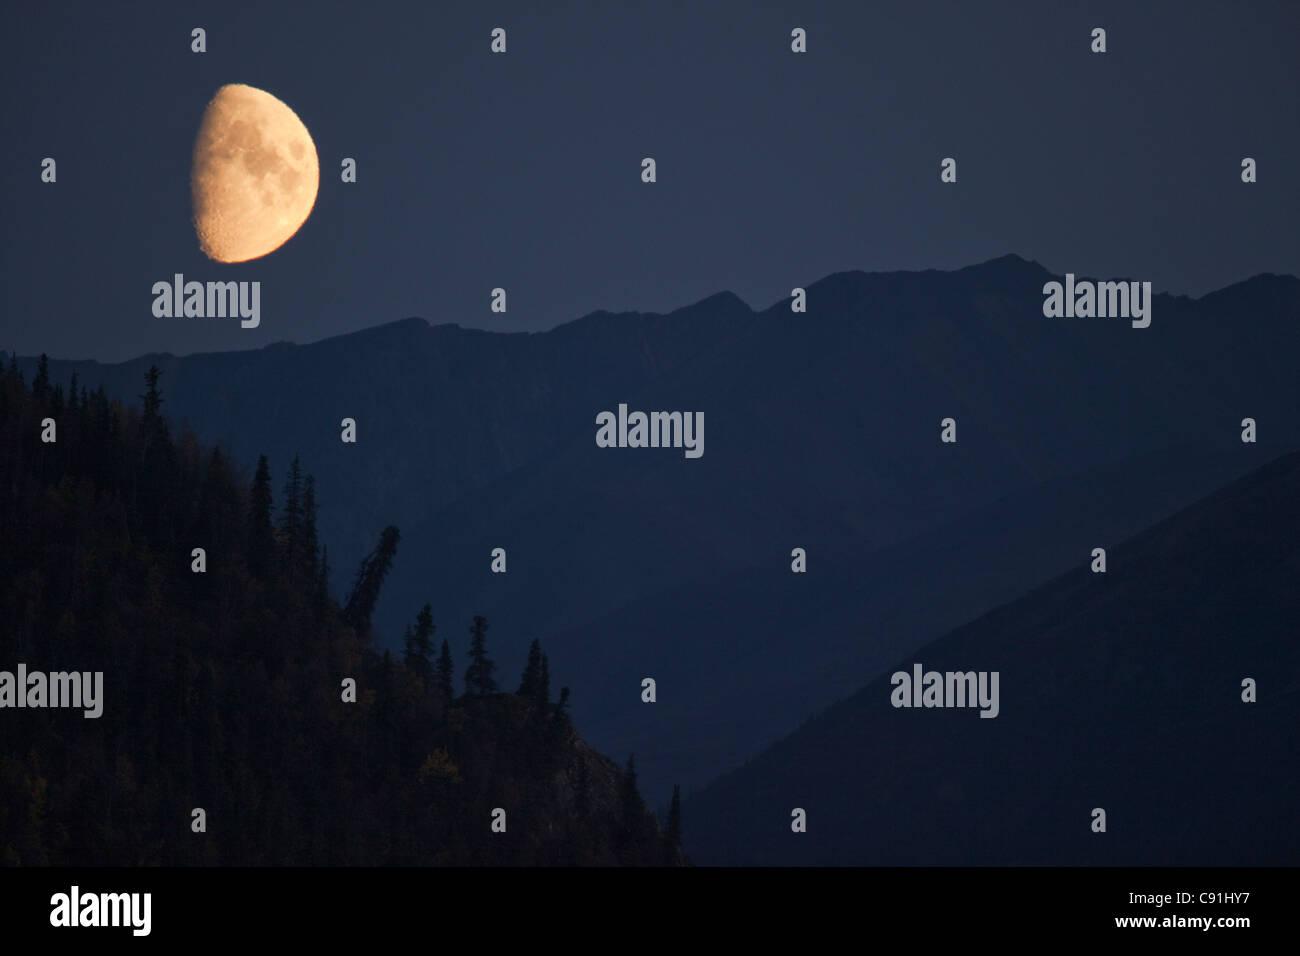 Moonrise near Denali National Park entrance, Denali National Park, Interior Alaska, Autumn - Stock Image